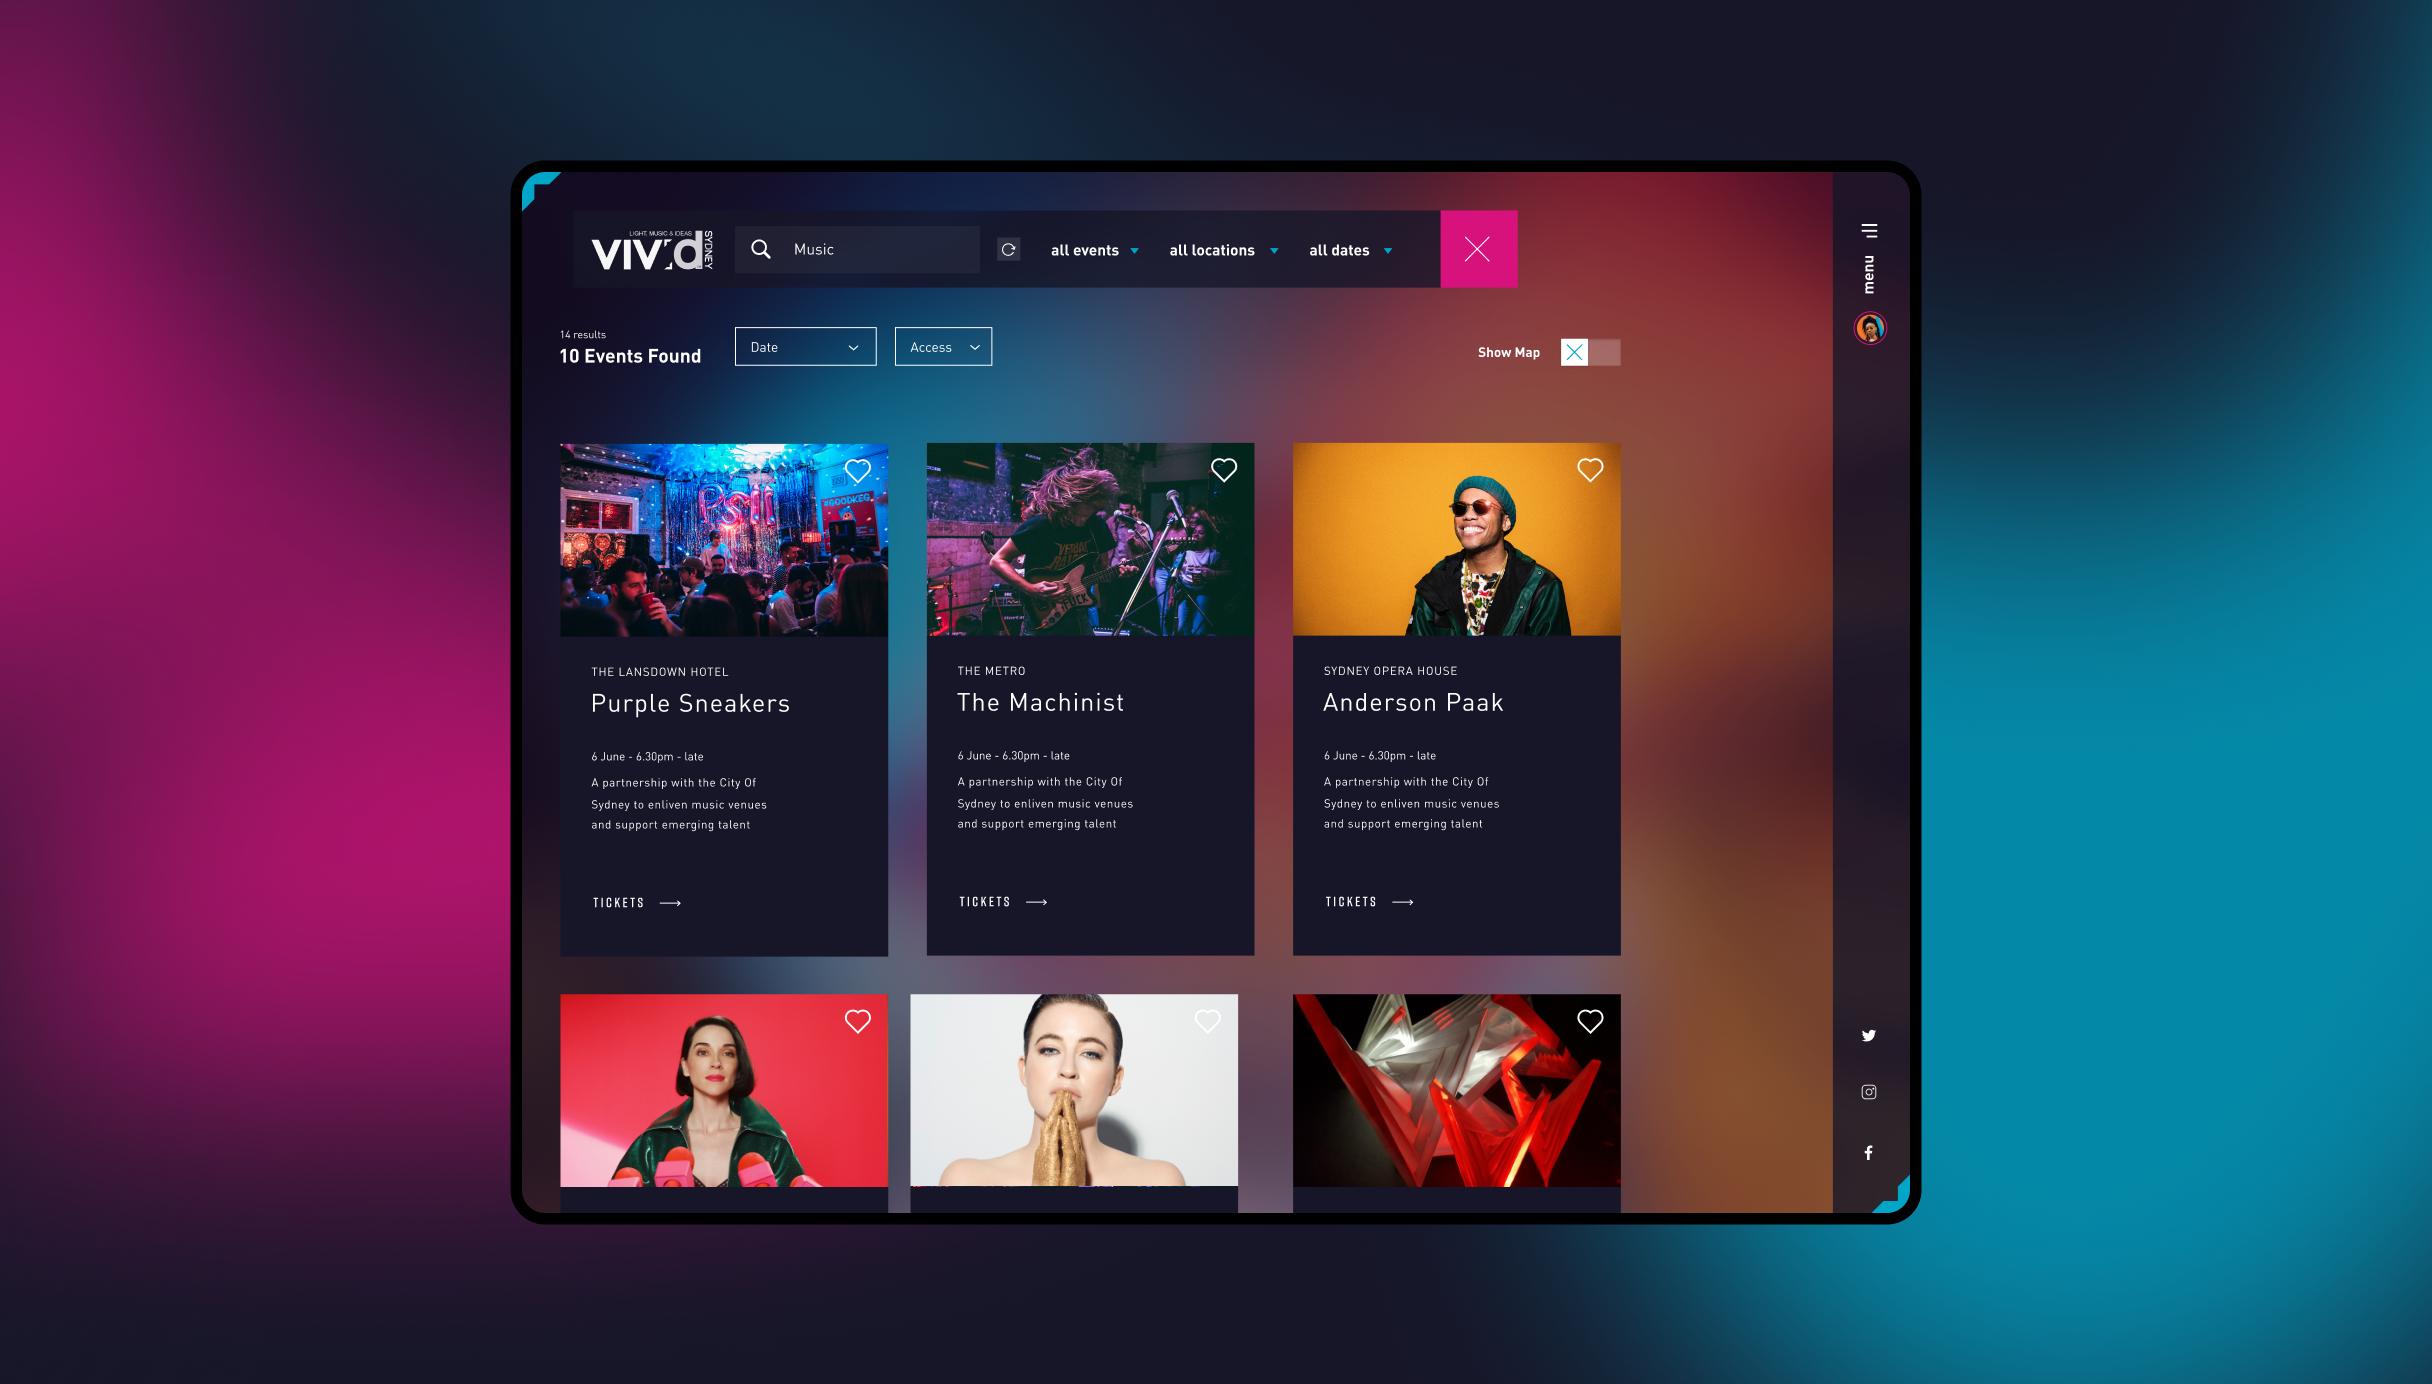 Vivid Sydney desktop screen showcasing search